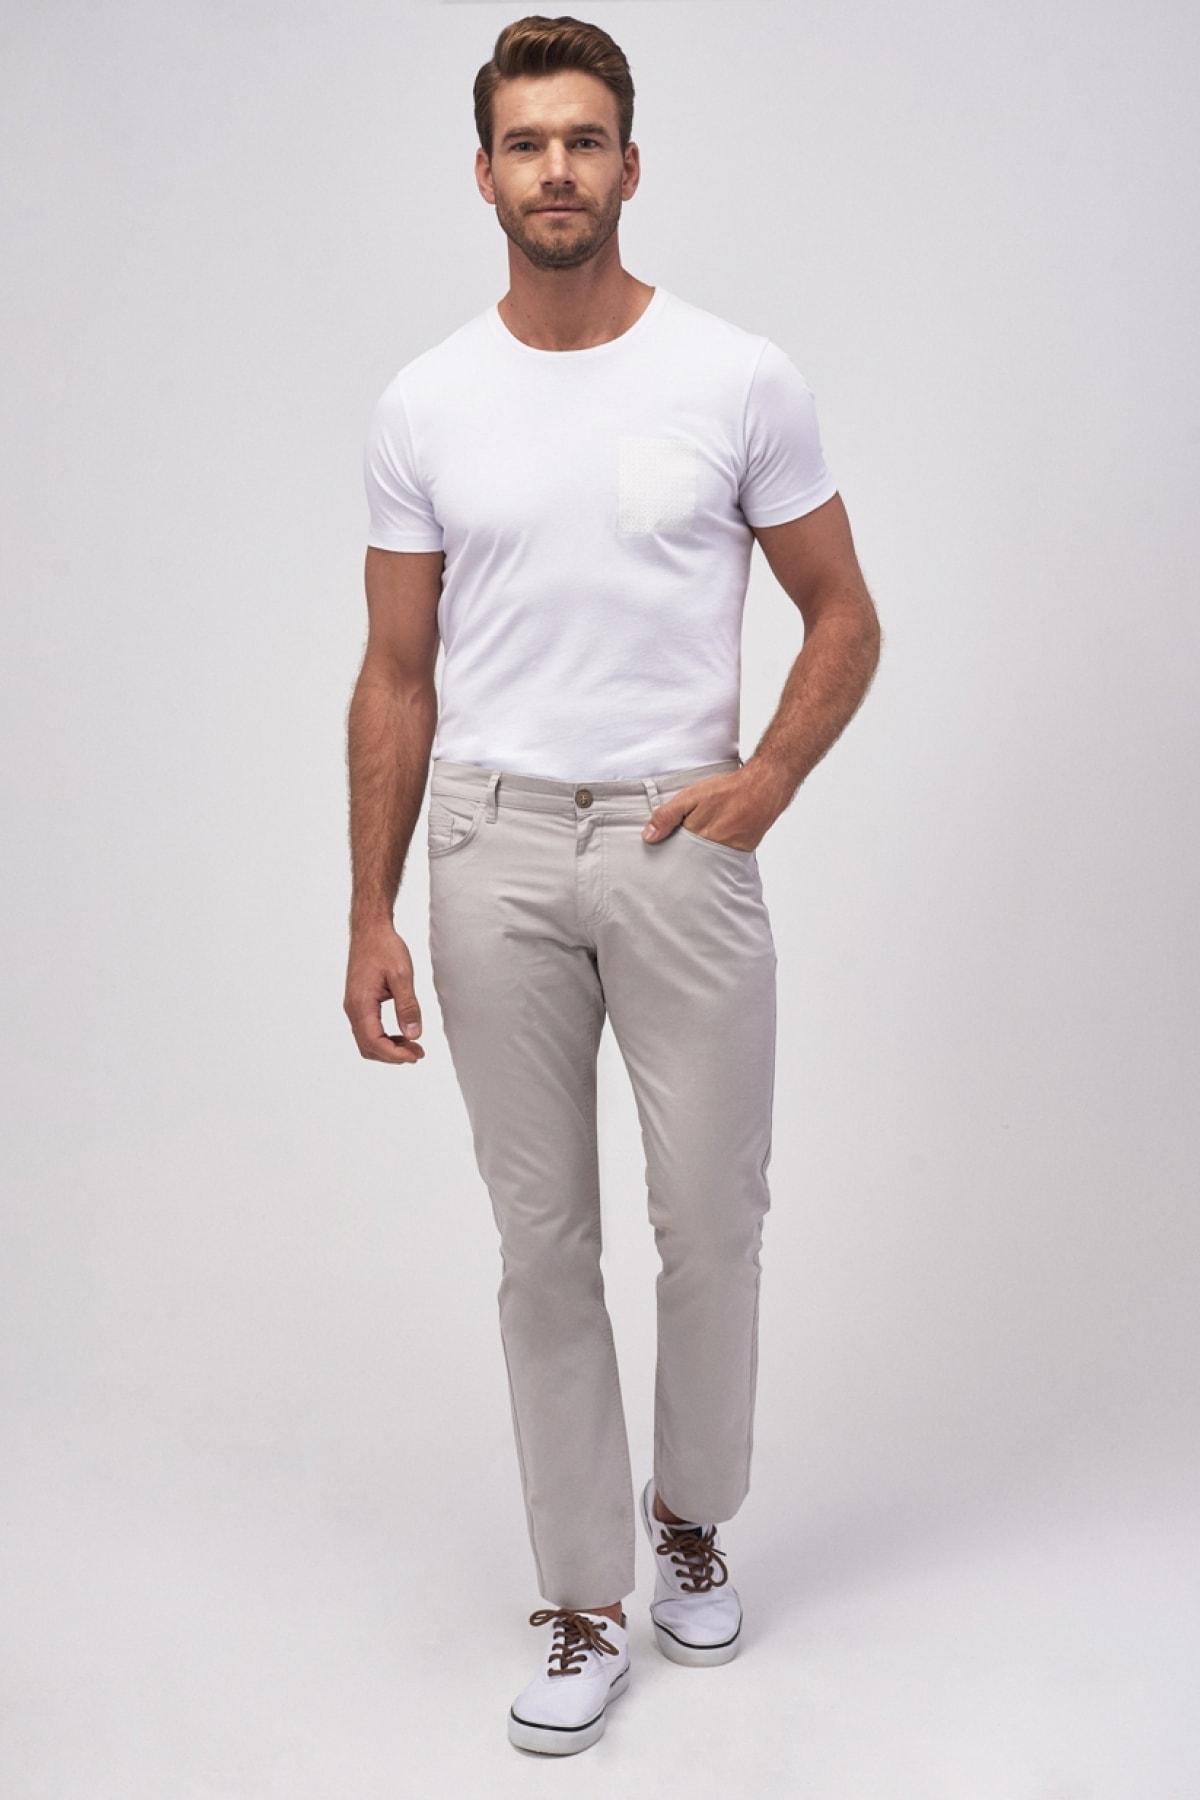 ALTINYILDIZ CLASSICS Erkek Taş Kanvas Slim Fit Dar Kesim 5 Cep Pantolon 1